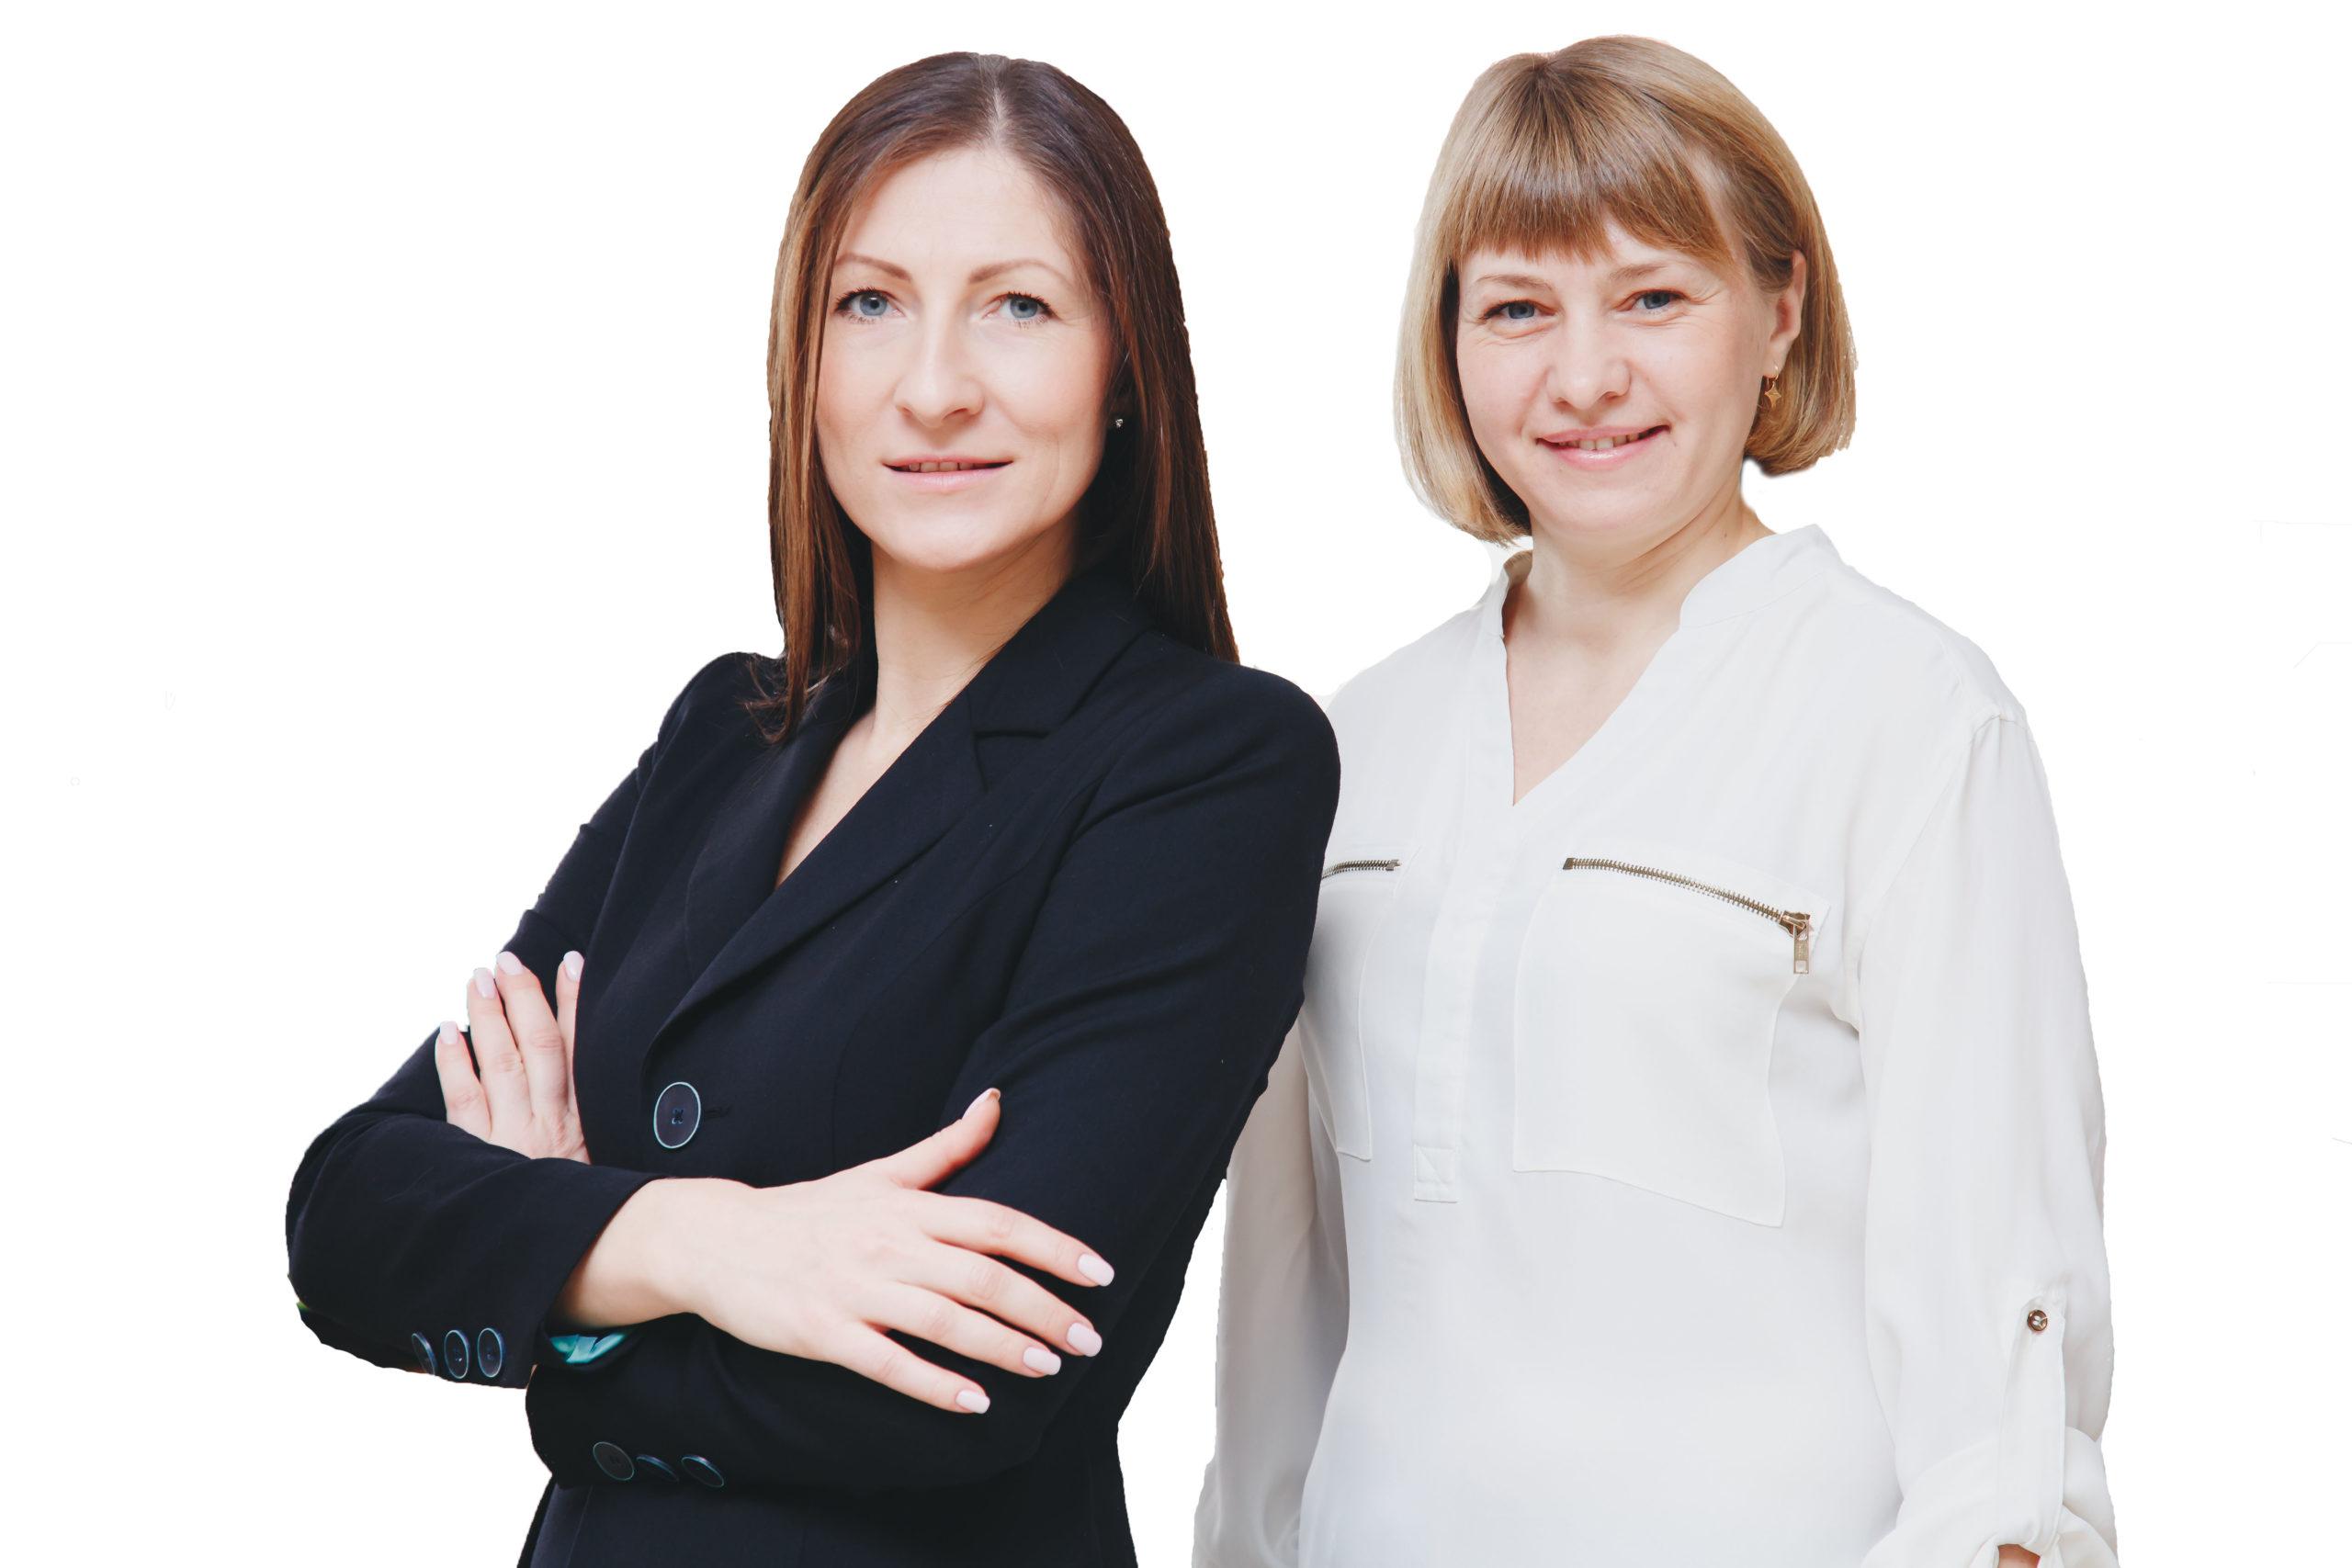 Мария Цуркан, Татьяна Гречкина, я начальник, школа руководителей